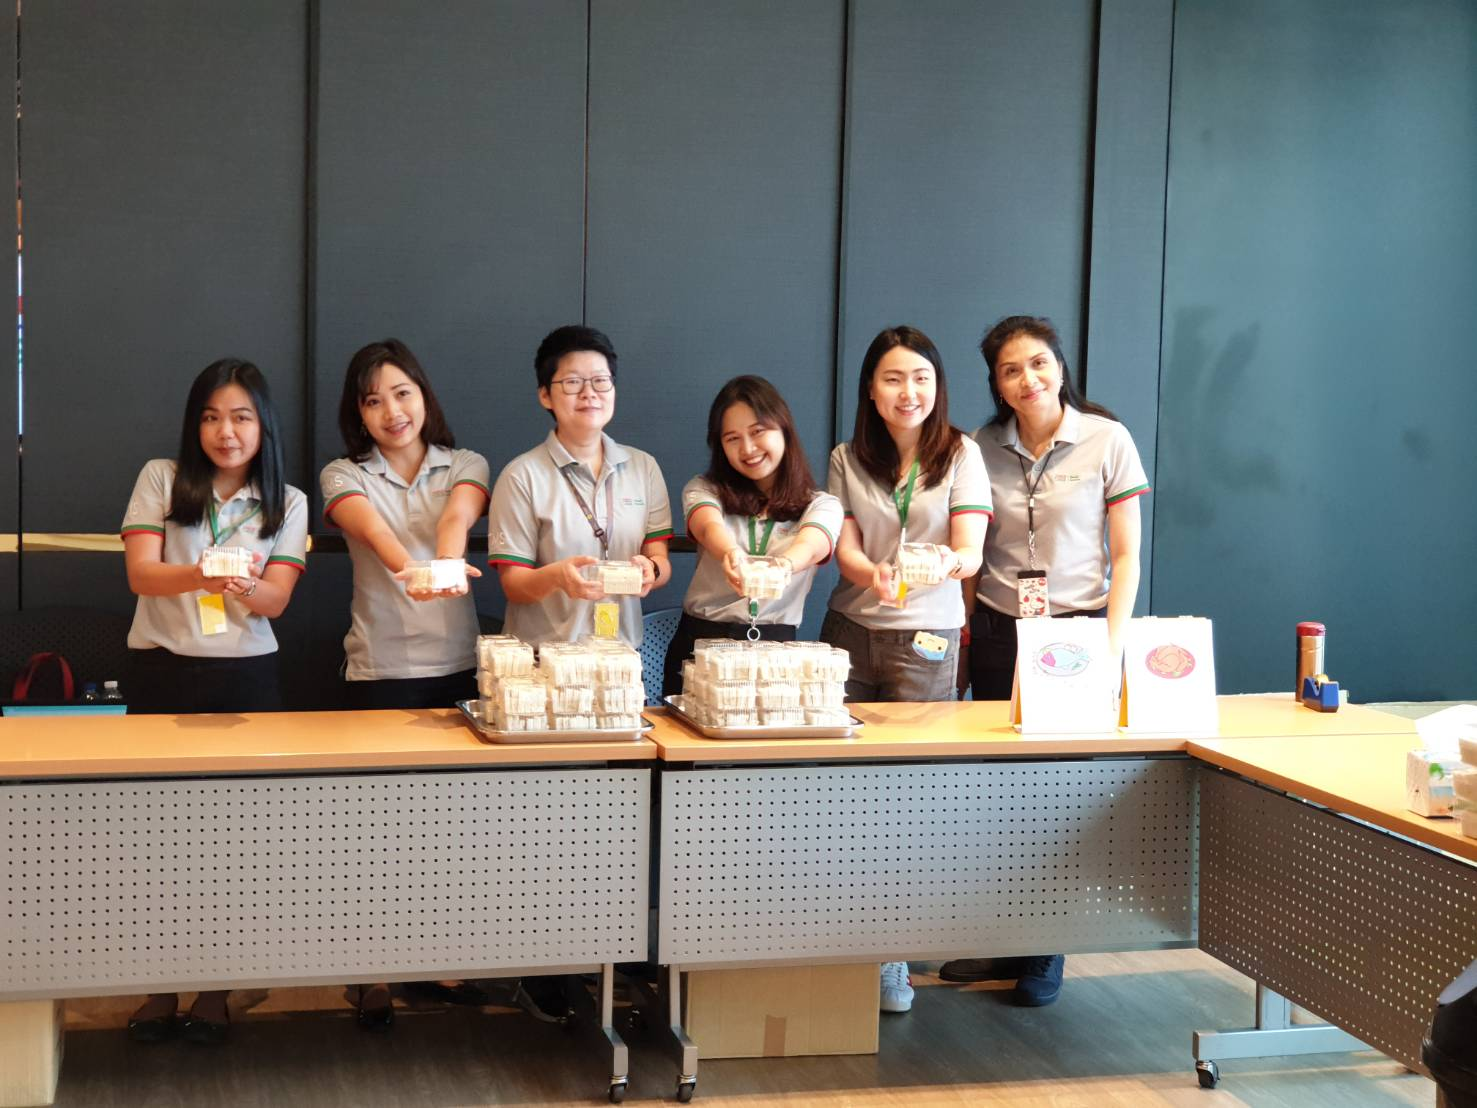 Catering27-snackbox-สแน็คบ๊อกซ์-จัดเลี้ยง-catering_สัมมนา-ประชุม-ขนมปัง-ขนมเบรค-อาหารว่าง-lunchbox-CoffeeBreak-foodstallmenu